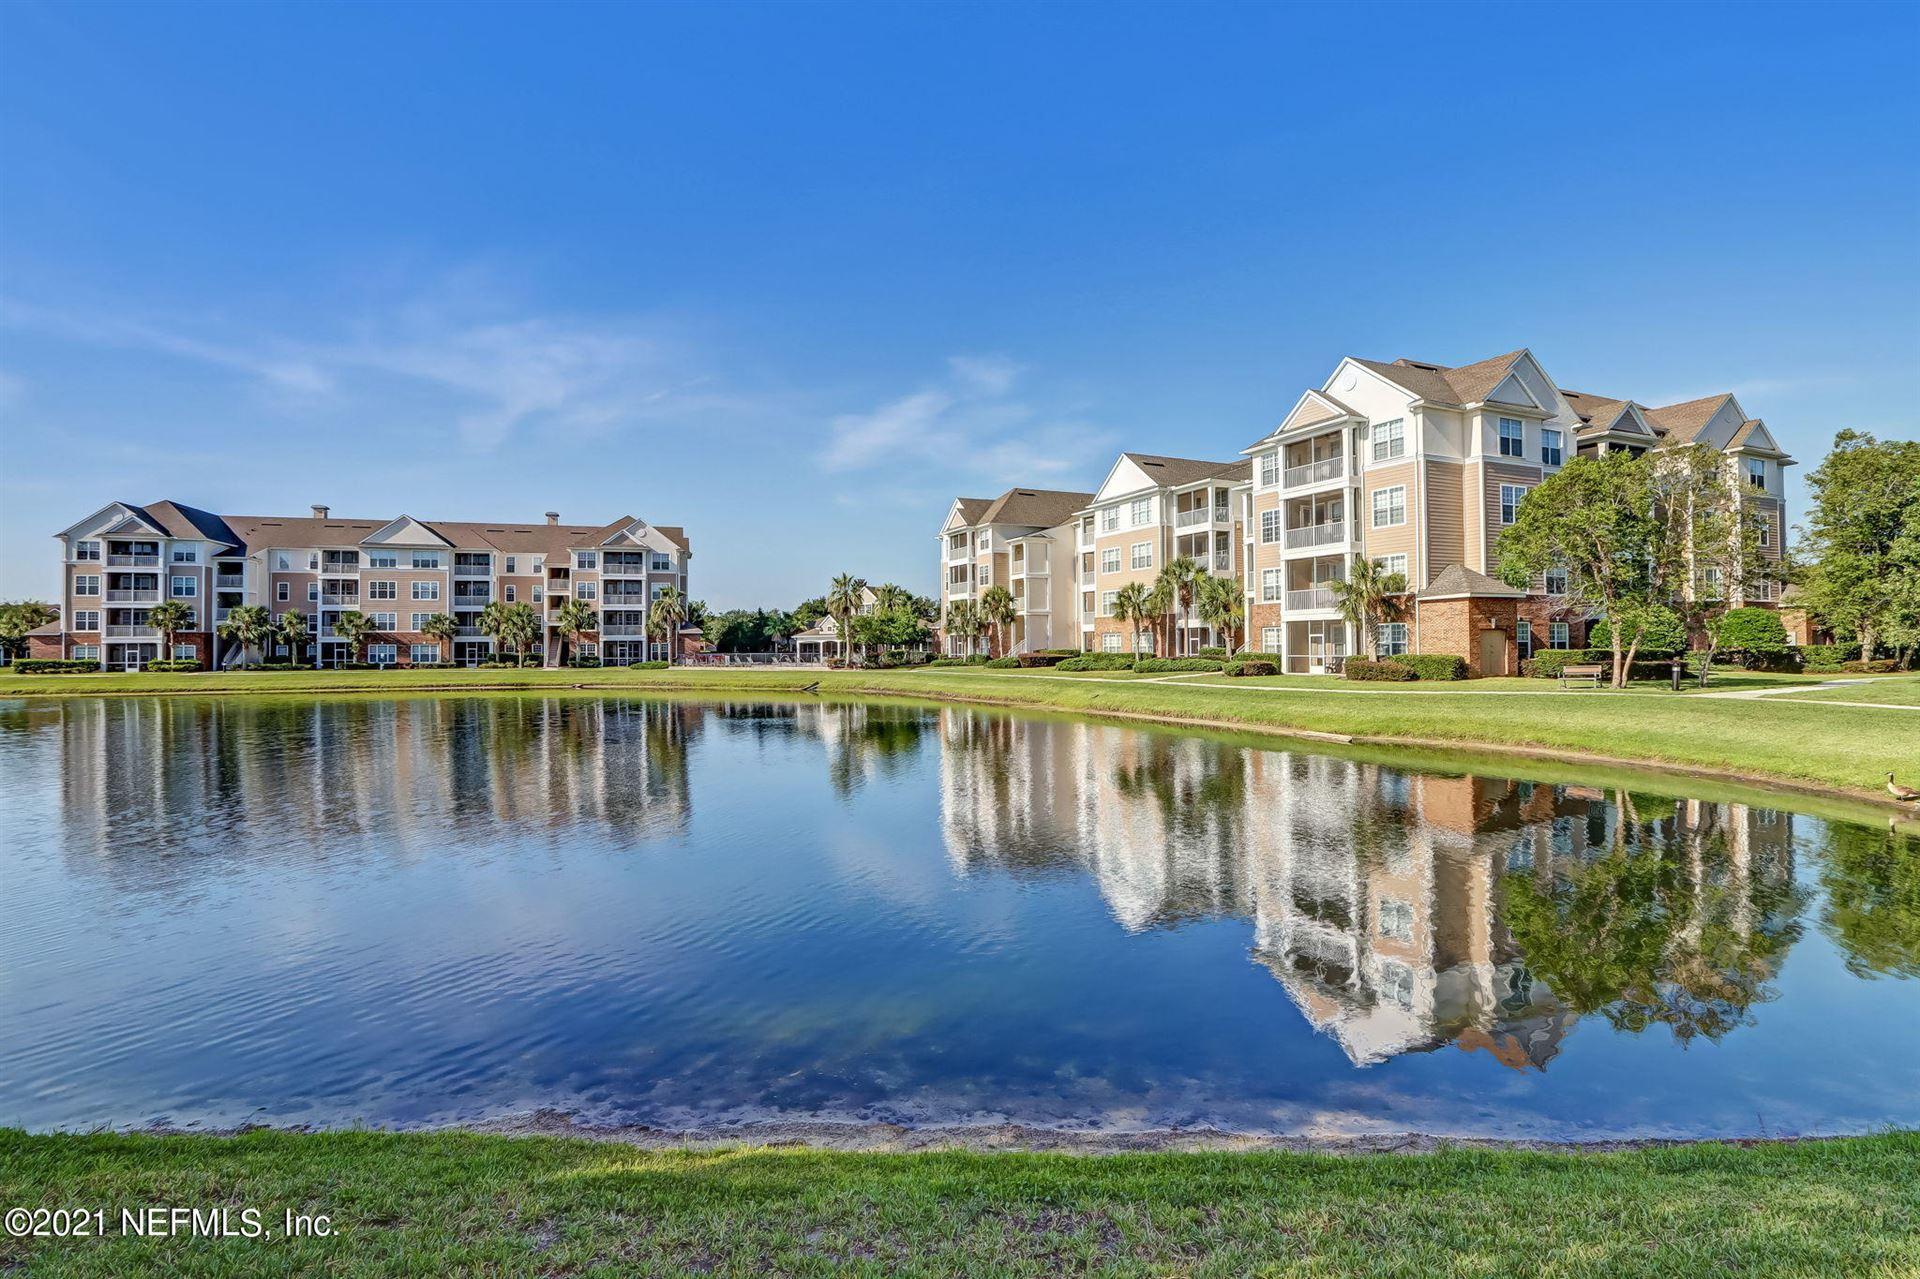 11251 CAMPFIELD DR, Jacksonville, FL 32256 - MLS#: 1114877